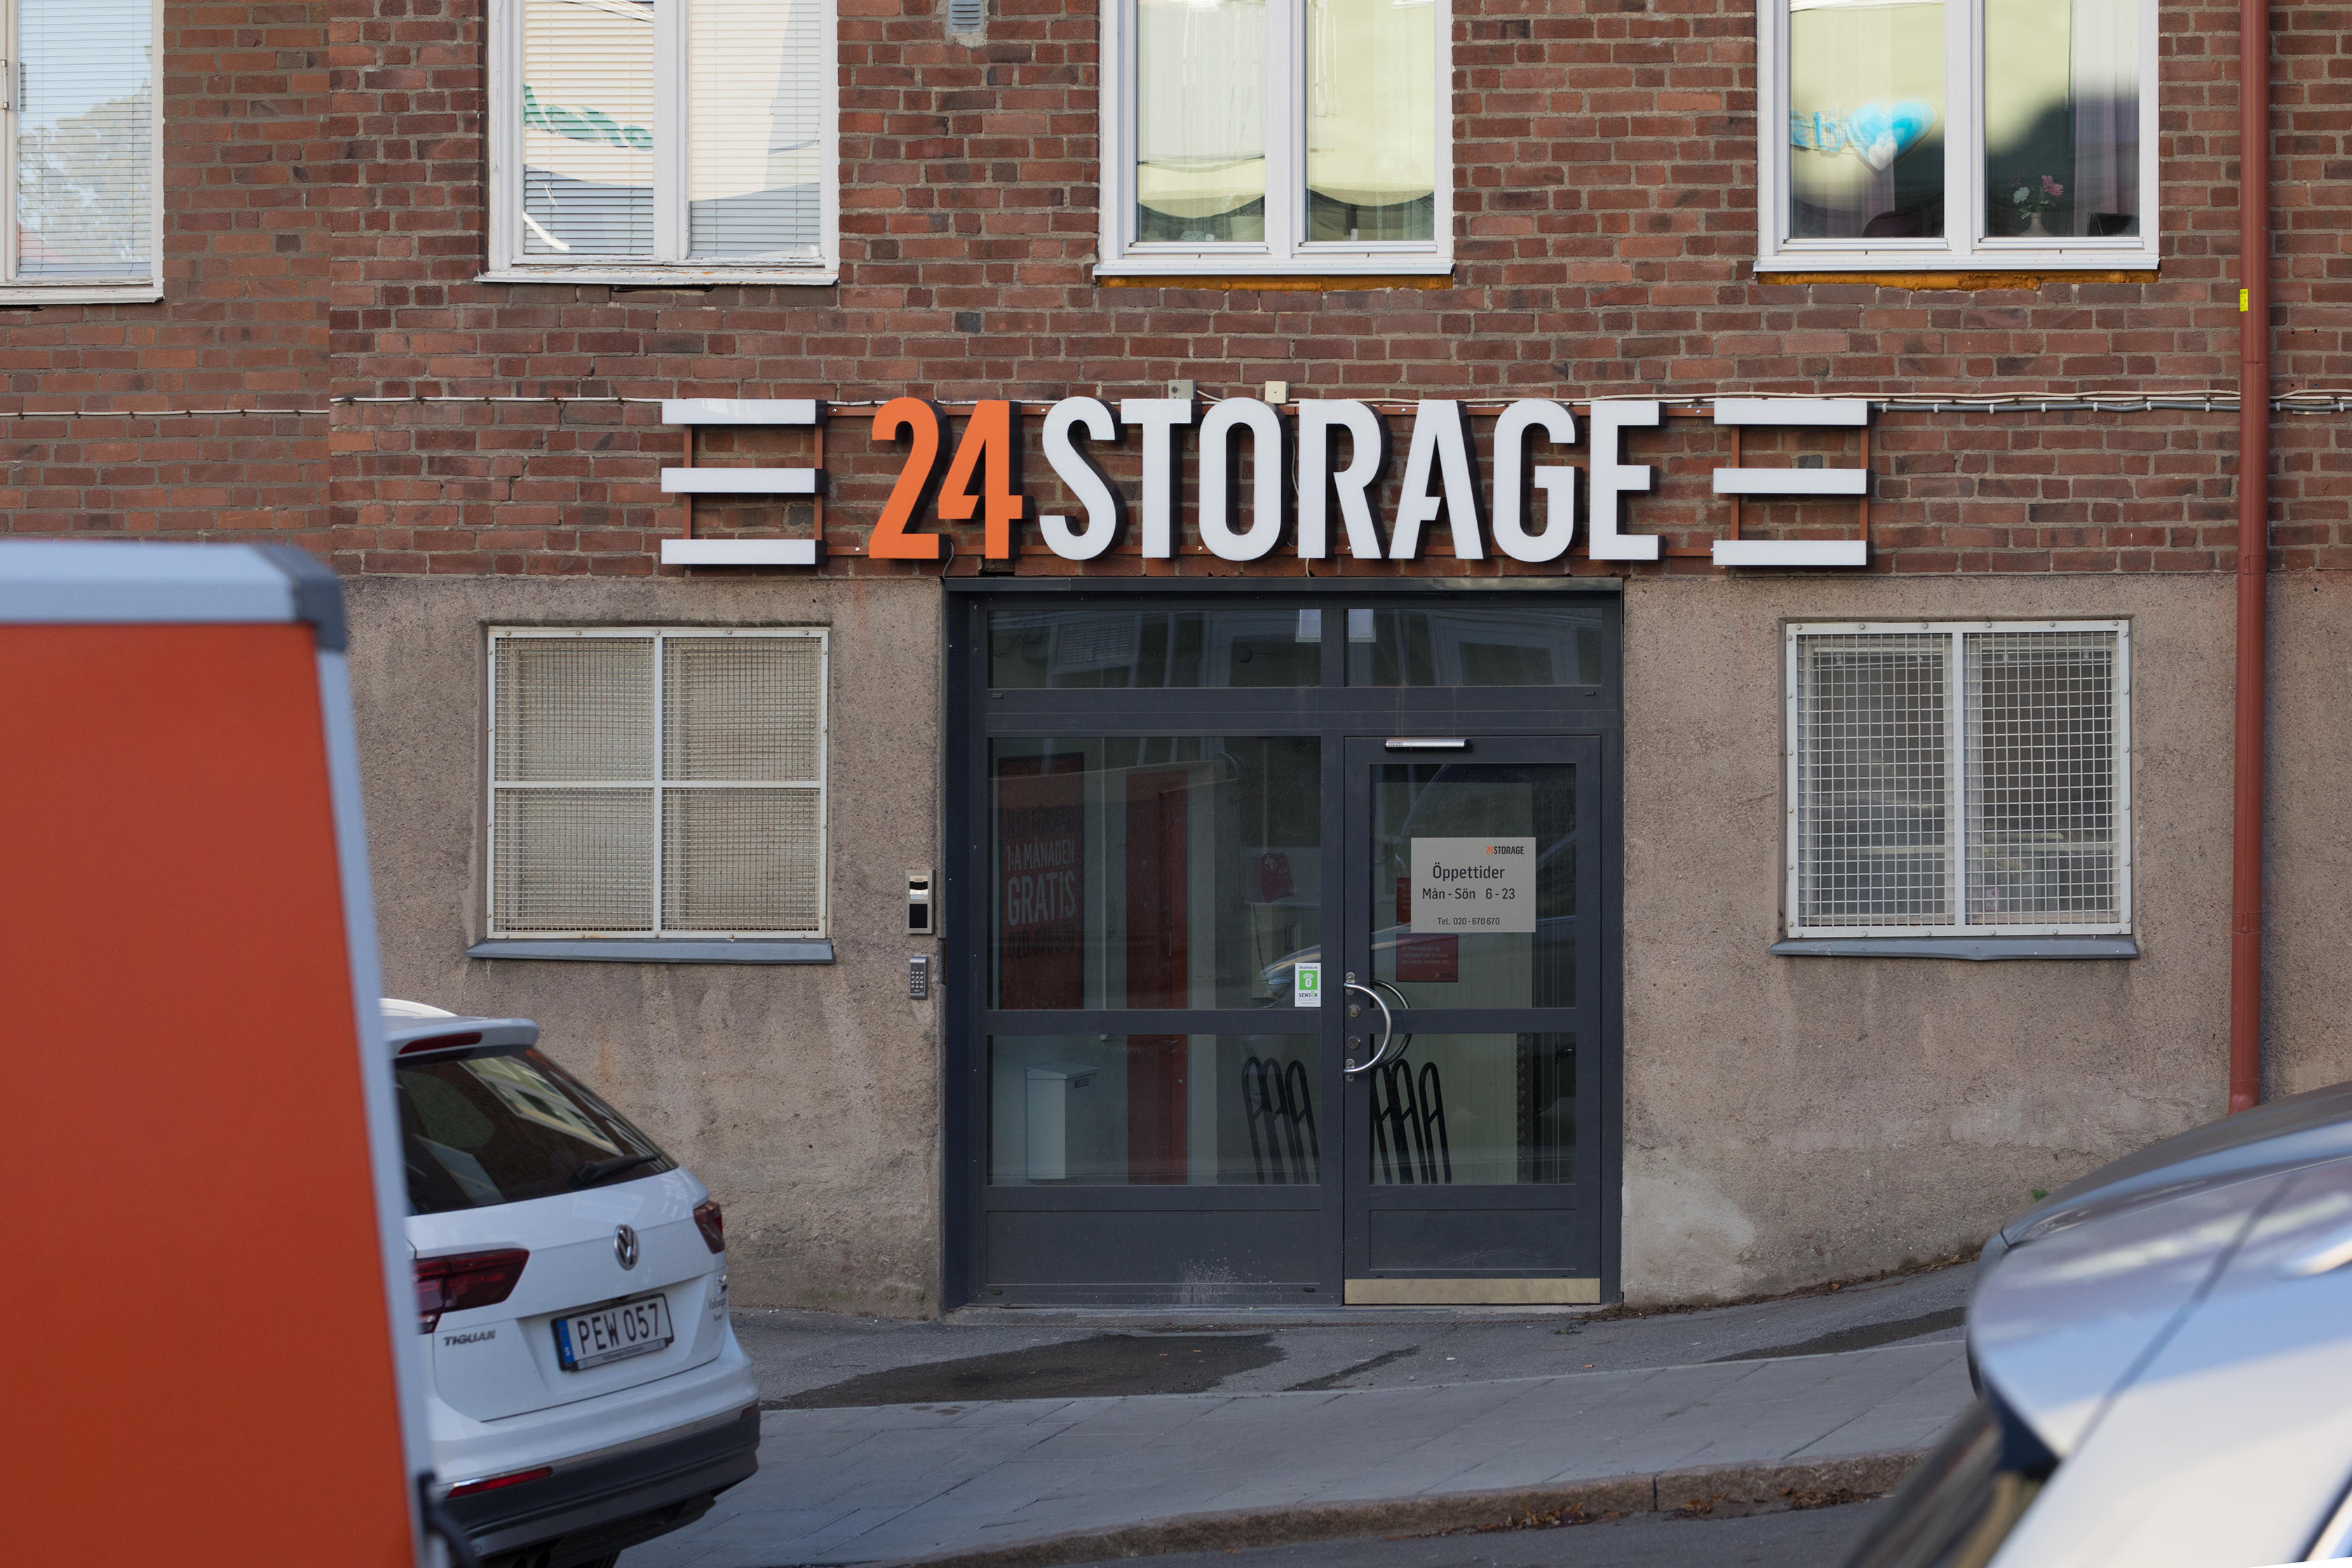 24Storage Sundbyberg Tule